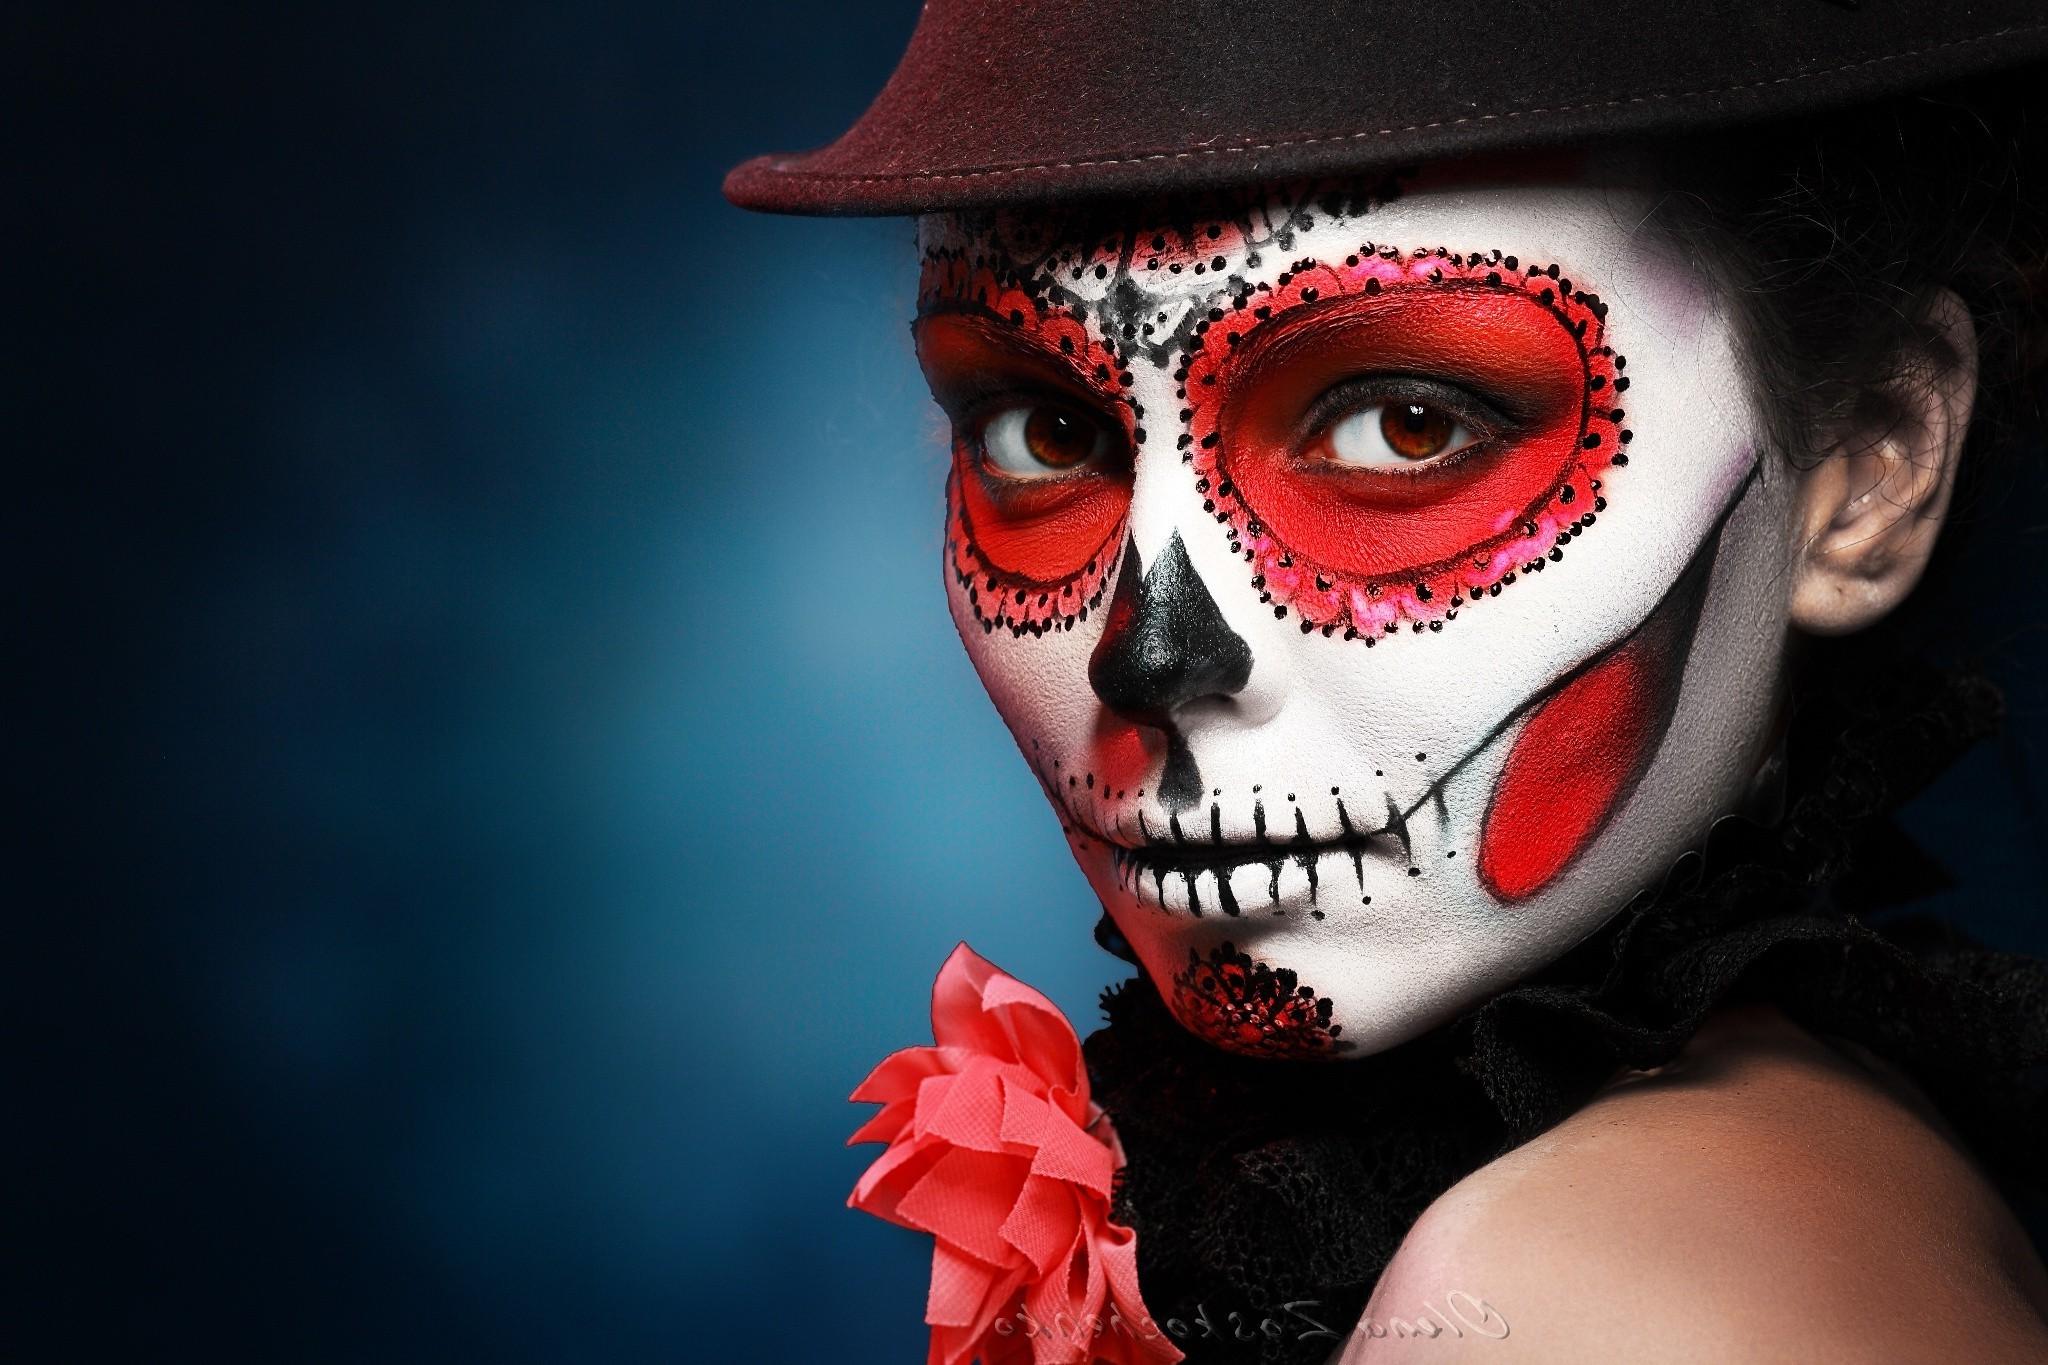 Fantastic Wallpaper Halloween Skull - face-red-hat-makeup-Halloween-mask-Sugar-Skull-clothing-head-entertainment-color-darkness-headgear-costume-2048x1365-px-masque-performing-arts-641458  Photograph_778168.jpg